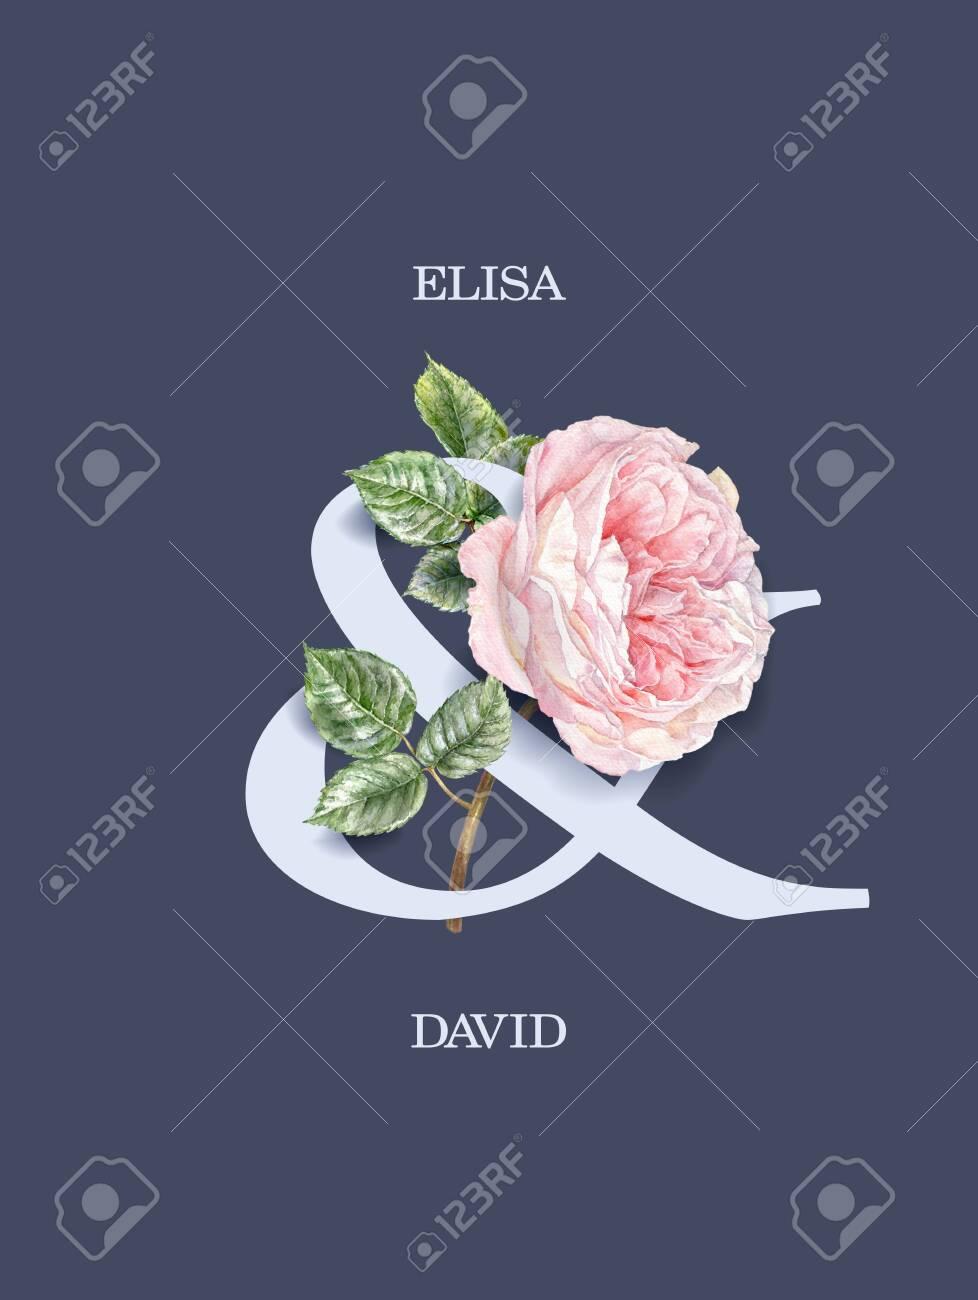 Watercolor pink rose flower wedding invitation card - 137493769